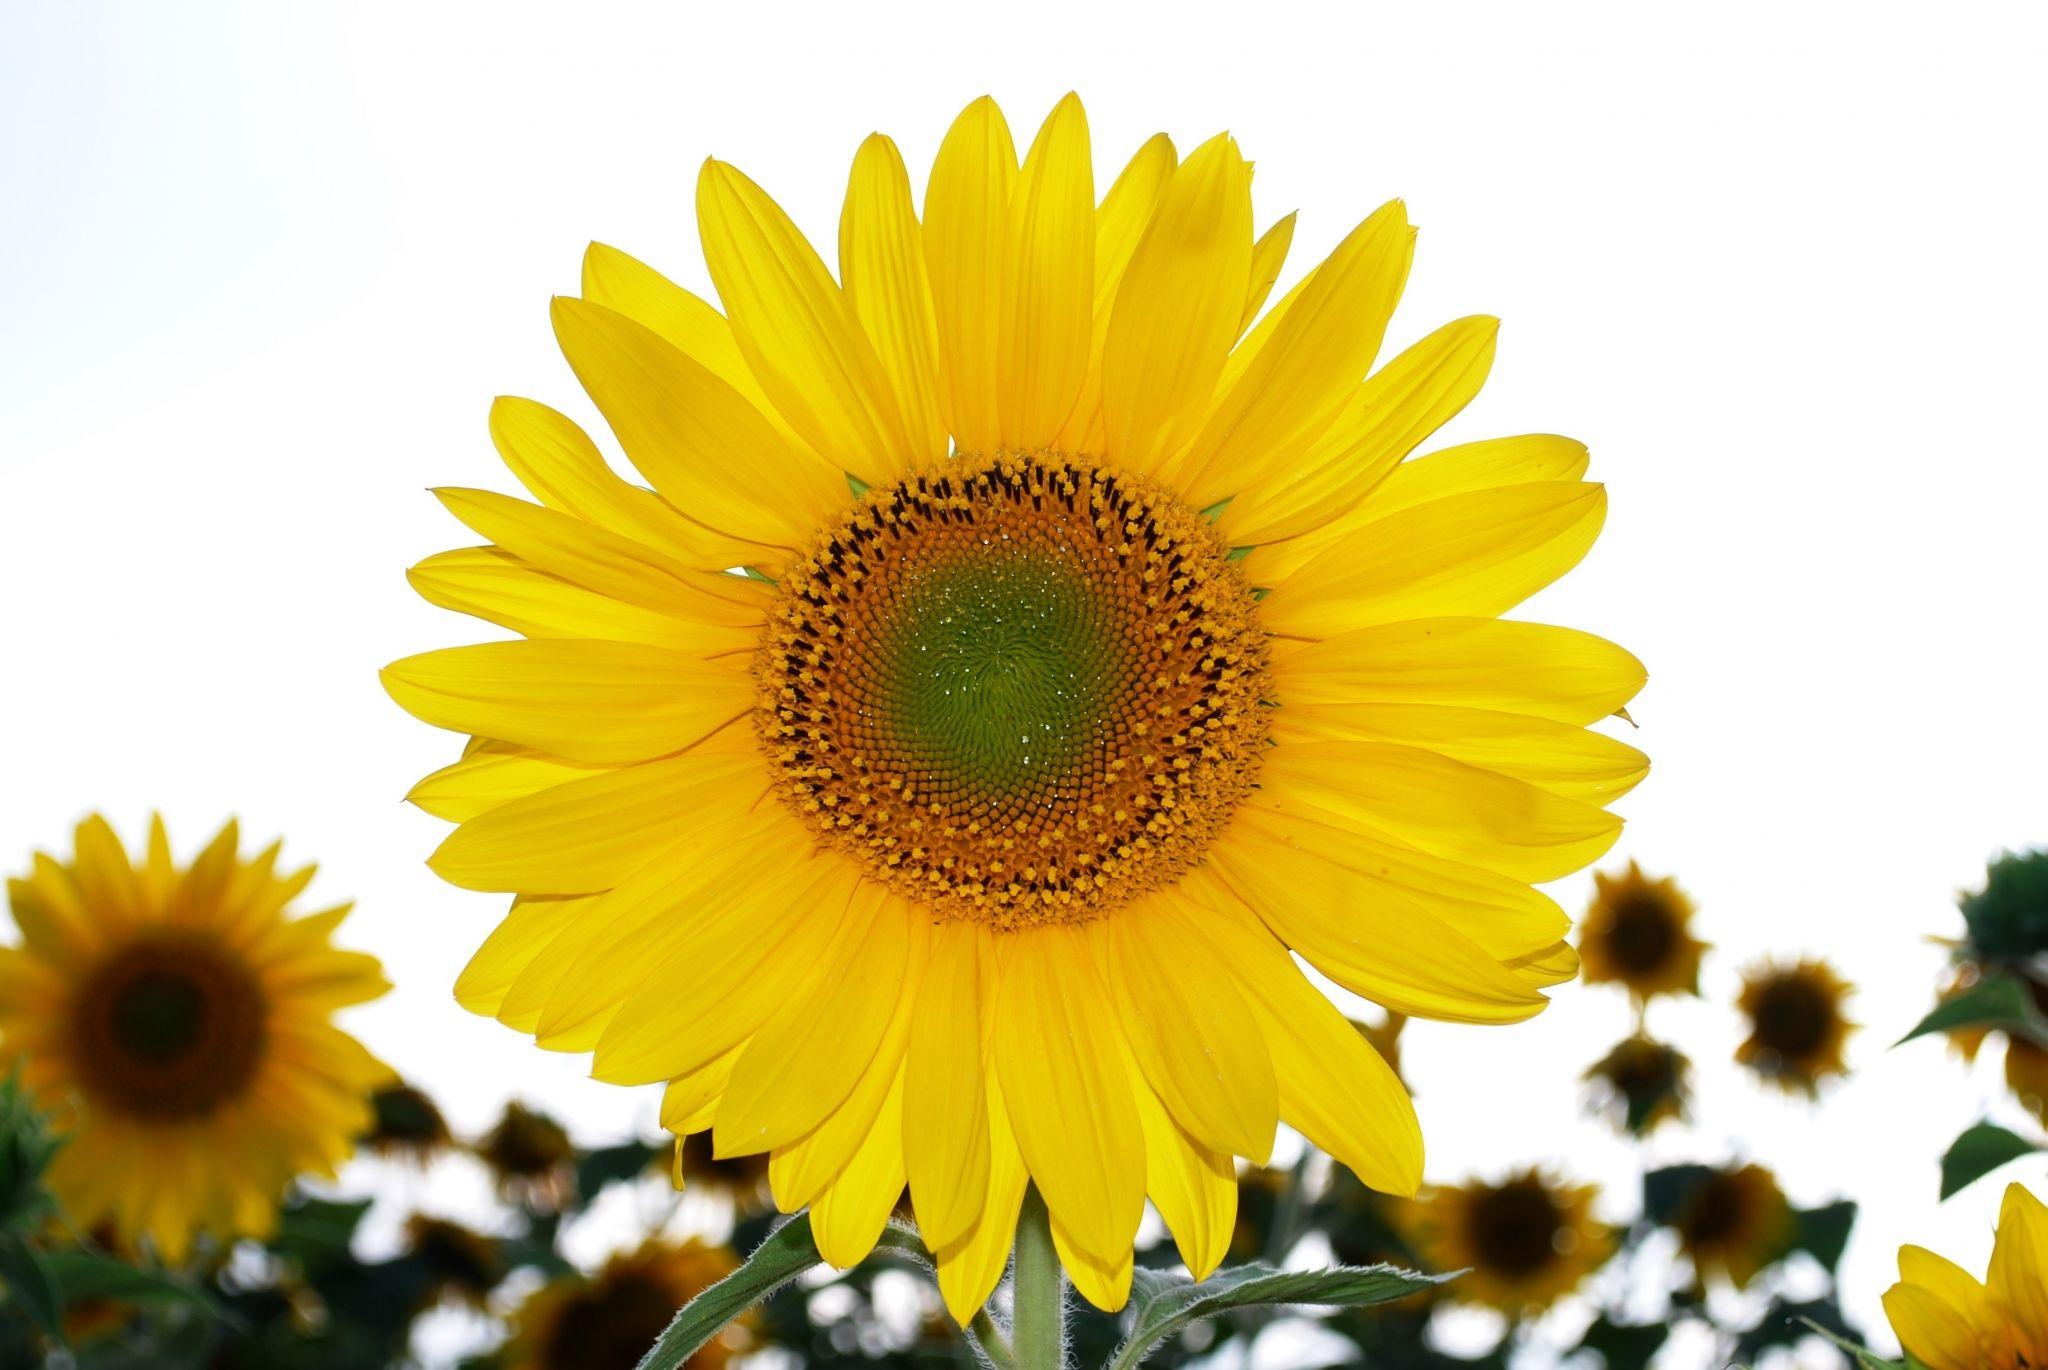 sunflower hd wallpapers 1080p windows Hd wallpapers